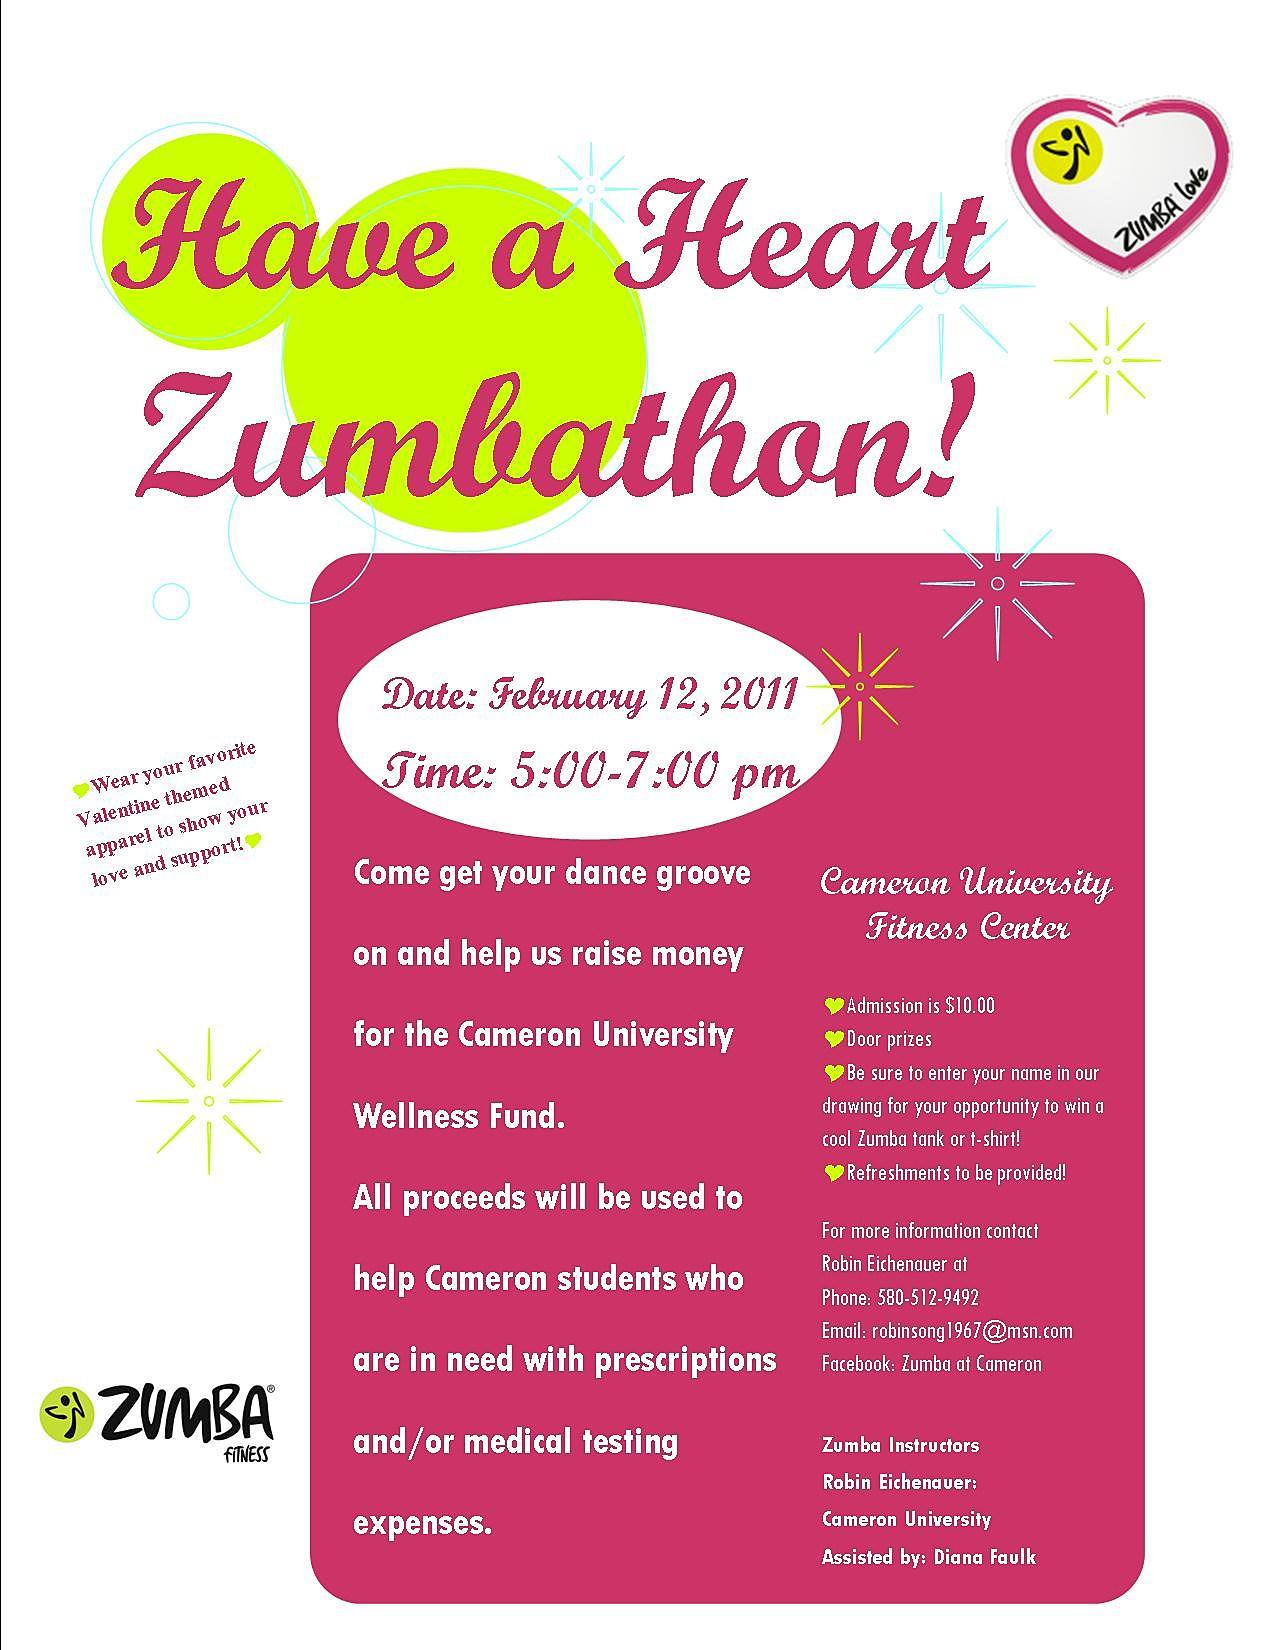 Zumbathon Flyers Zumbathon Flyers FreeZumbathon Flyer